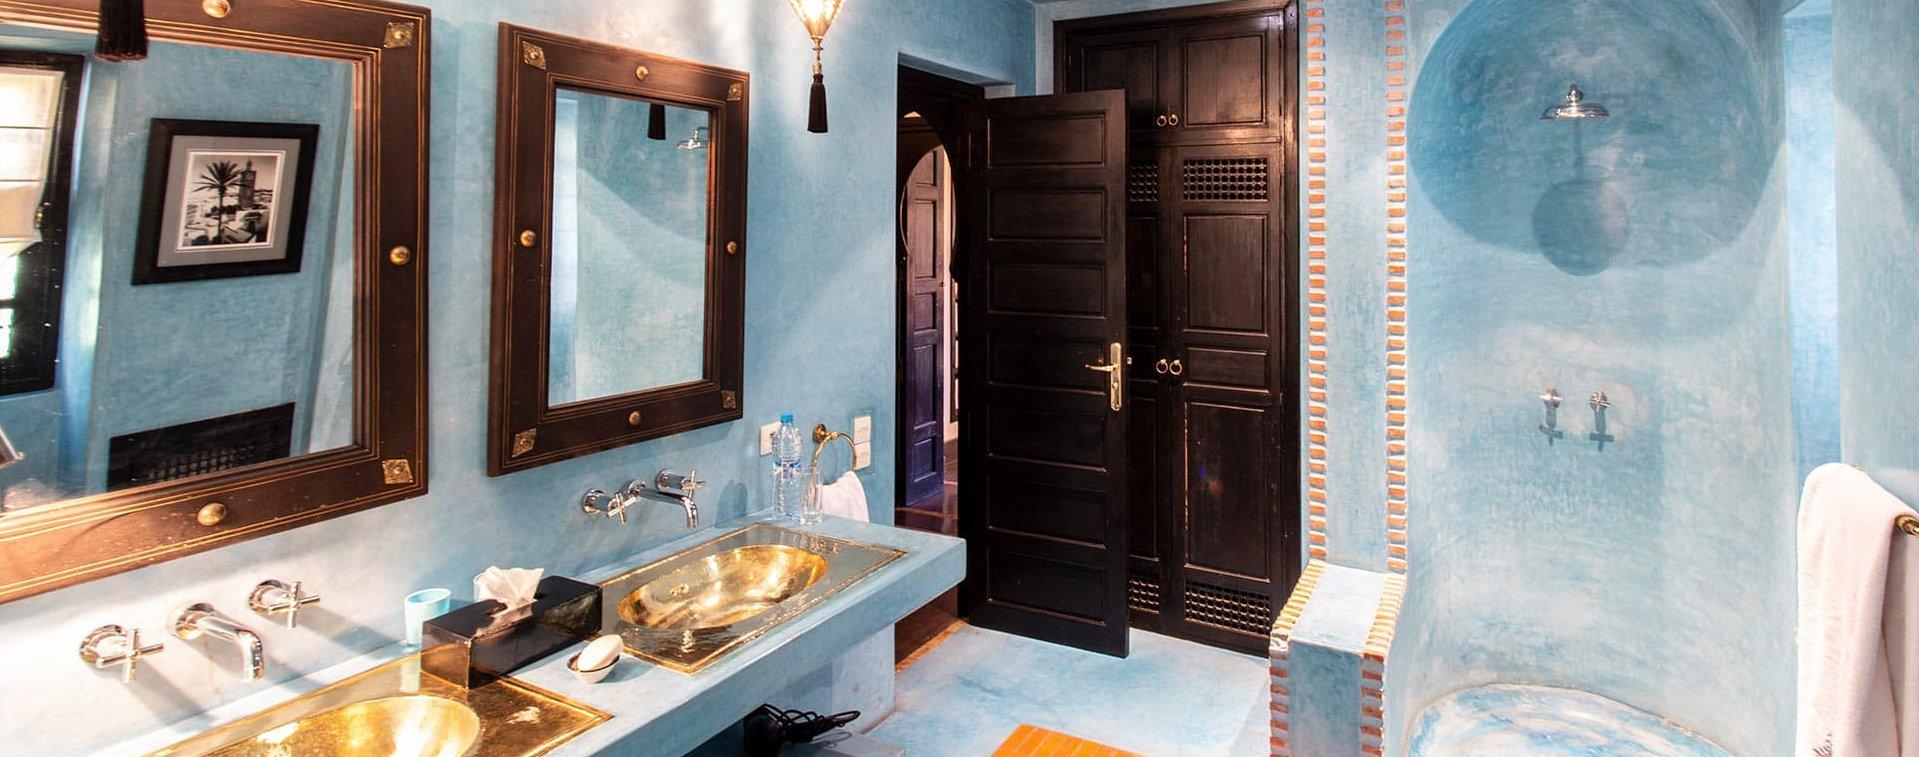 marrakech-villa-jacaranda-ensuite-shower